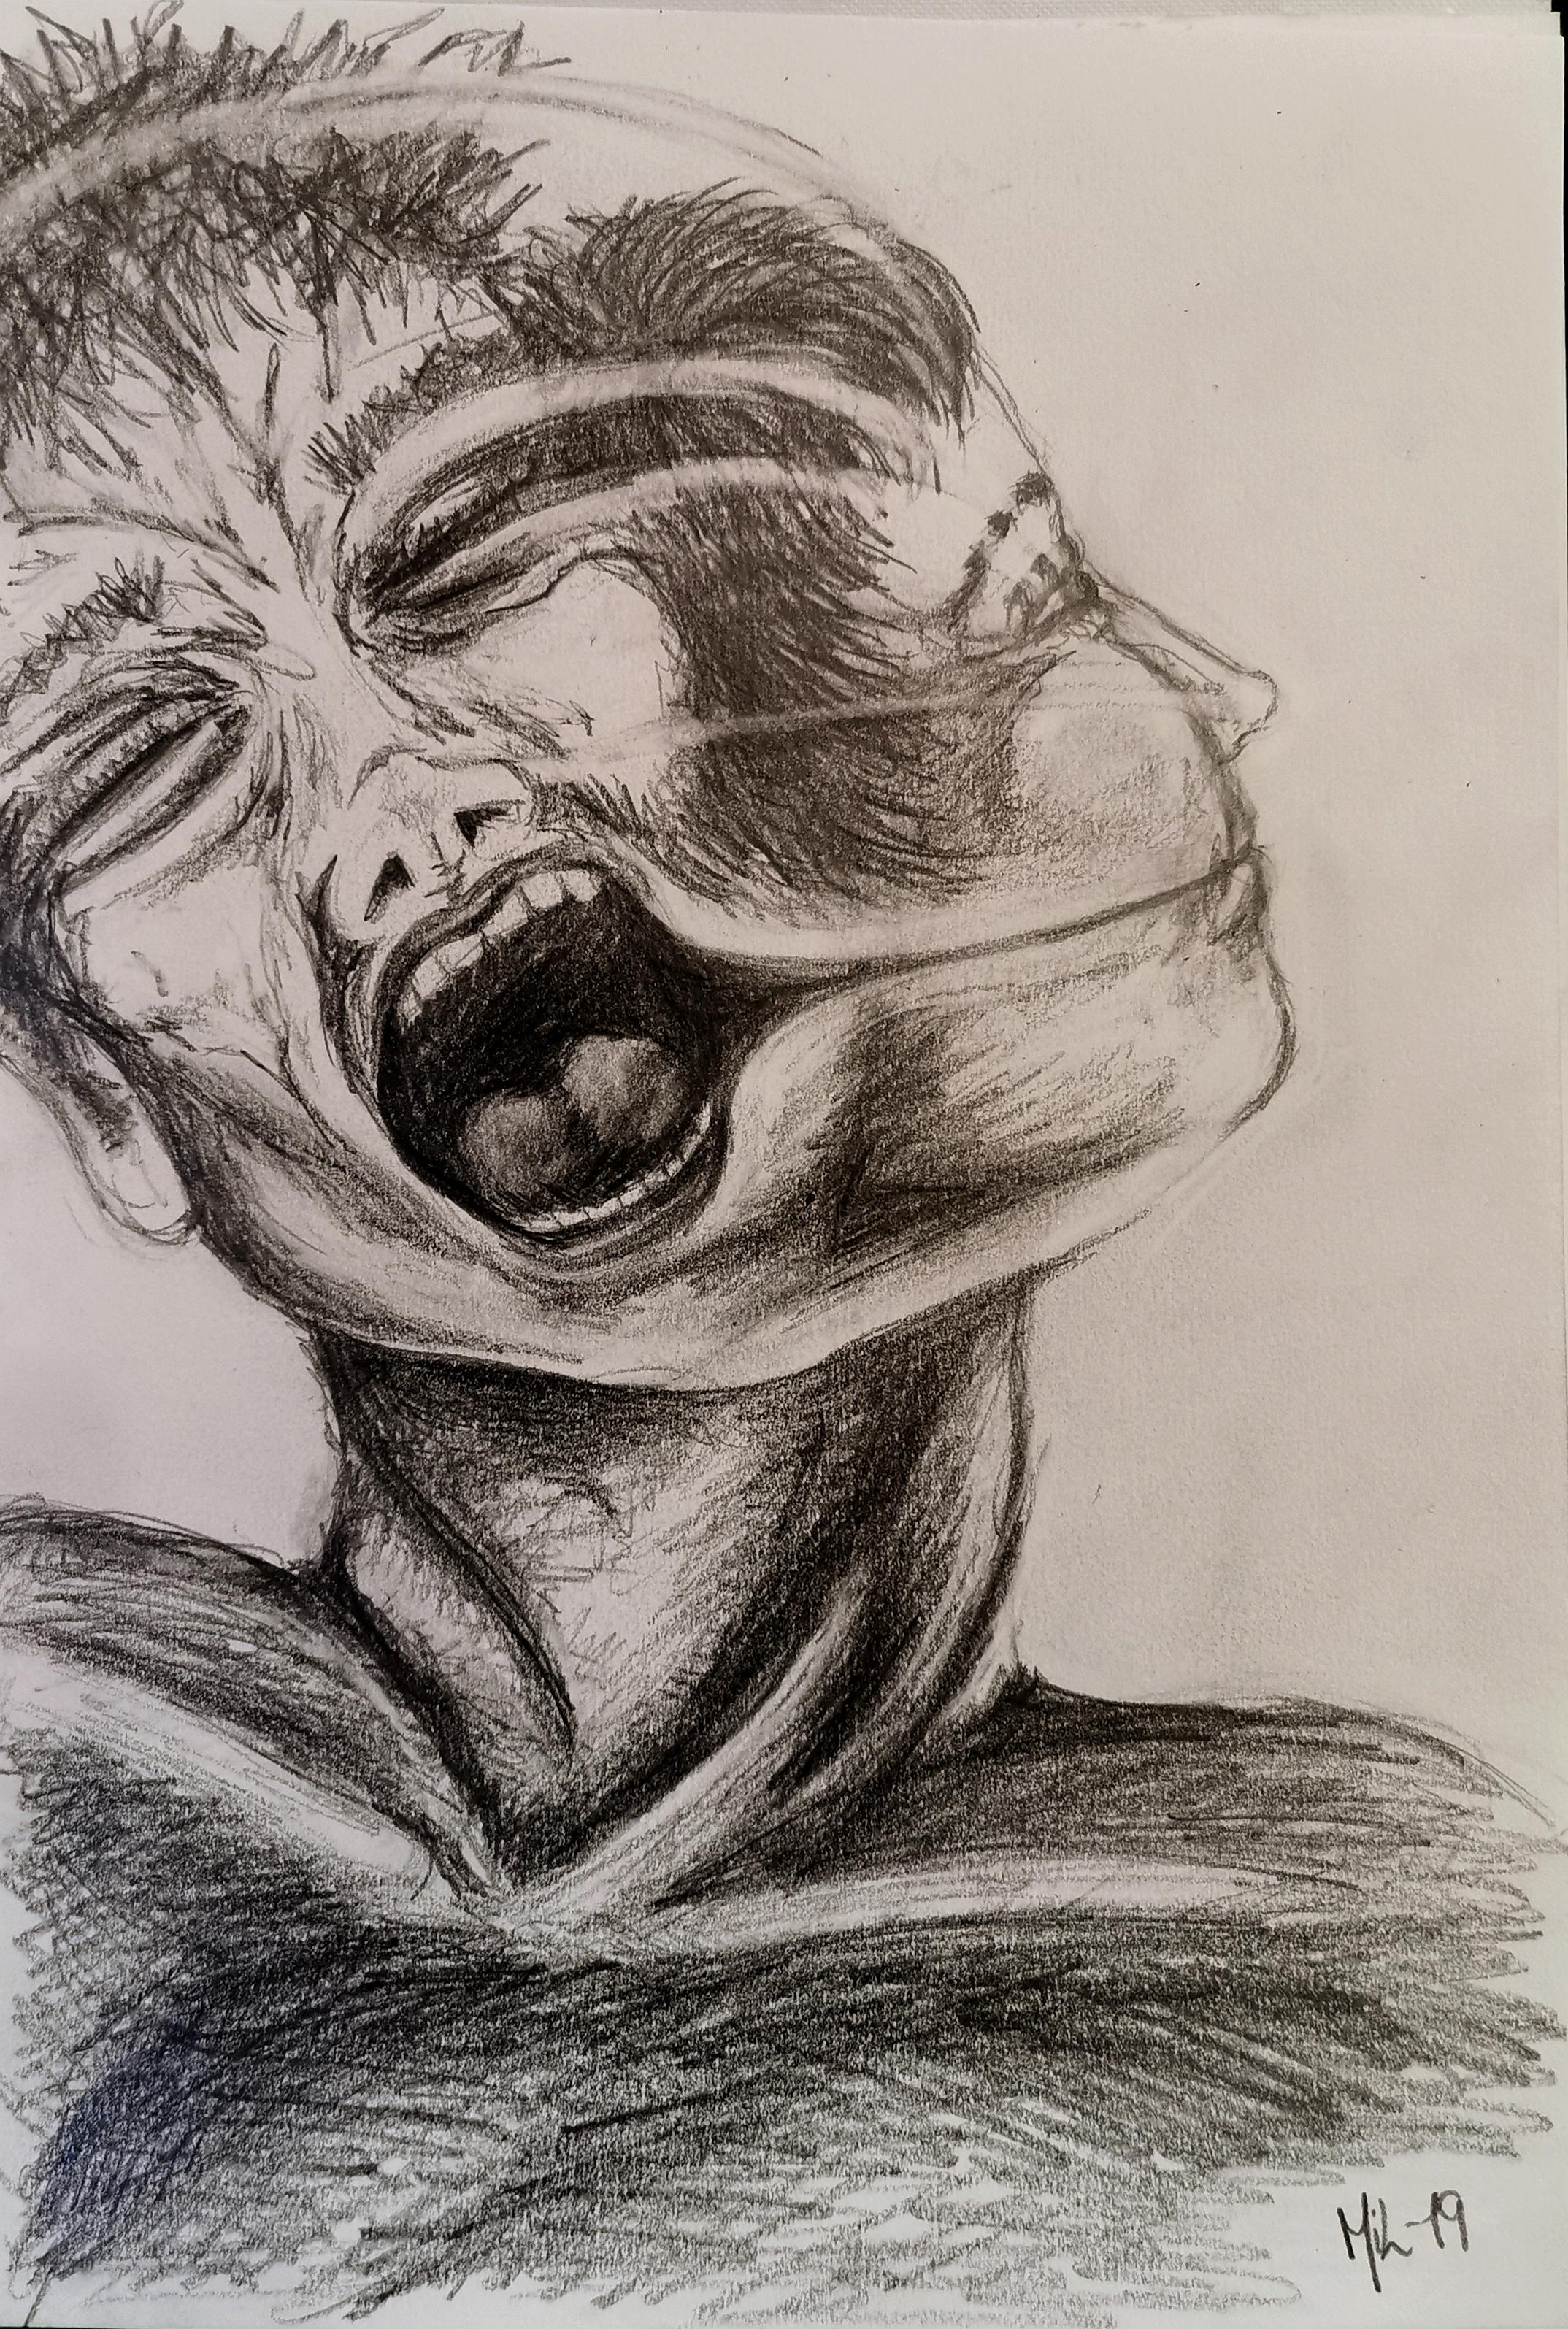 Bipolar liding